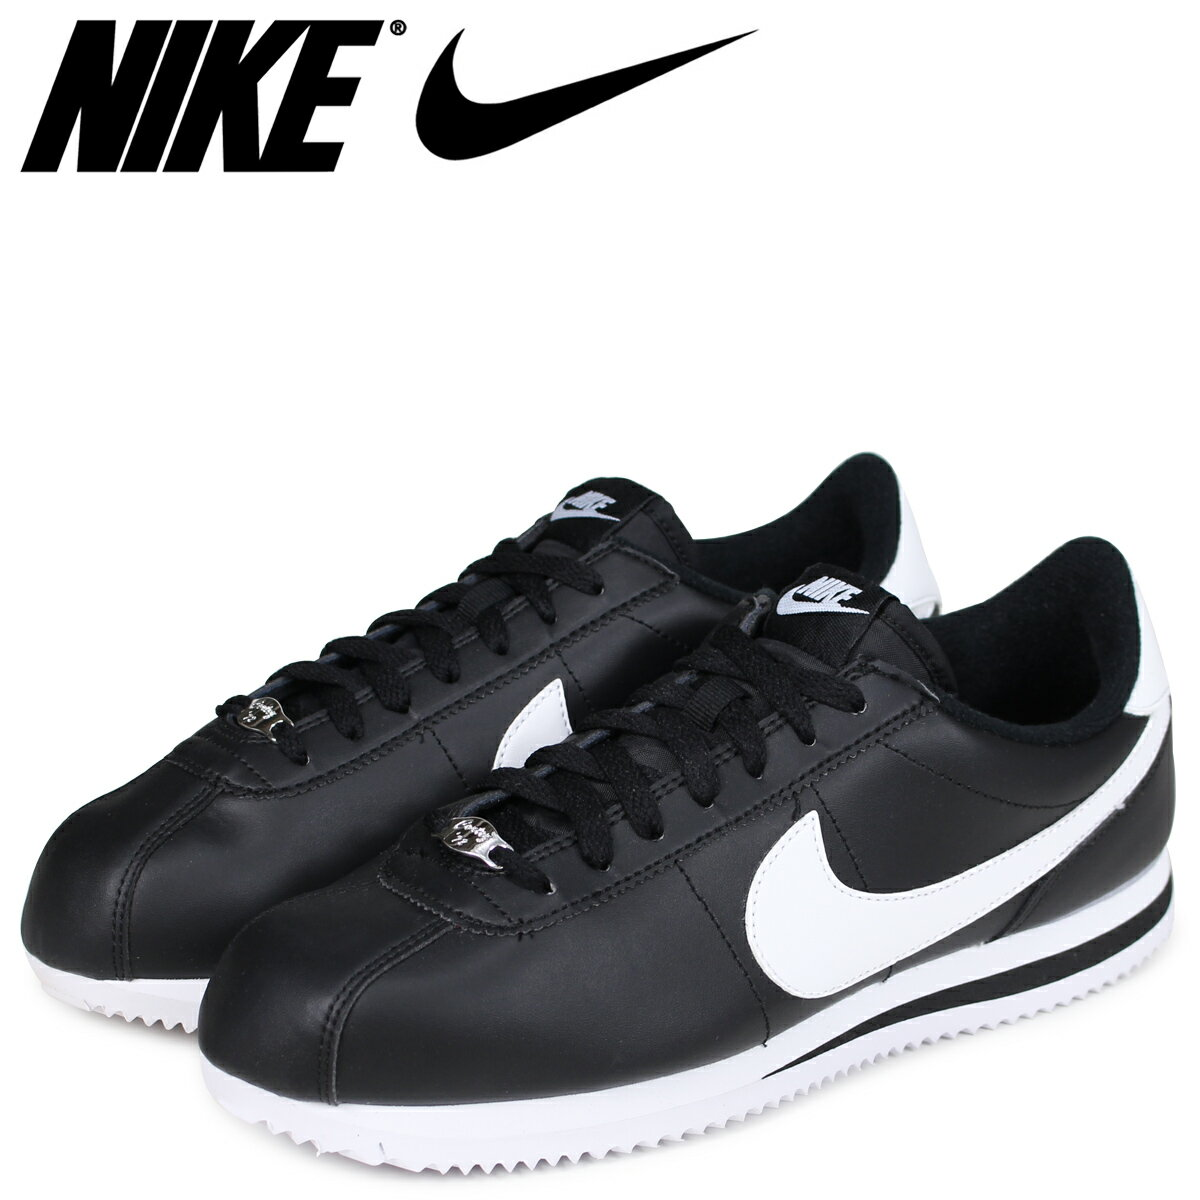 NIKE ナイキ コルテッツ スニーカー CORTEZ BASIC LEATHER 819719-012 メンズ 靴 ブラック [予約商品 7/19頃入荷予定 追加入荷]